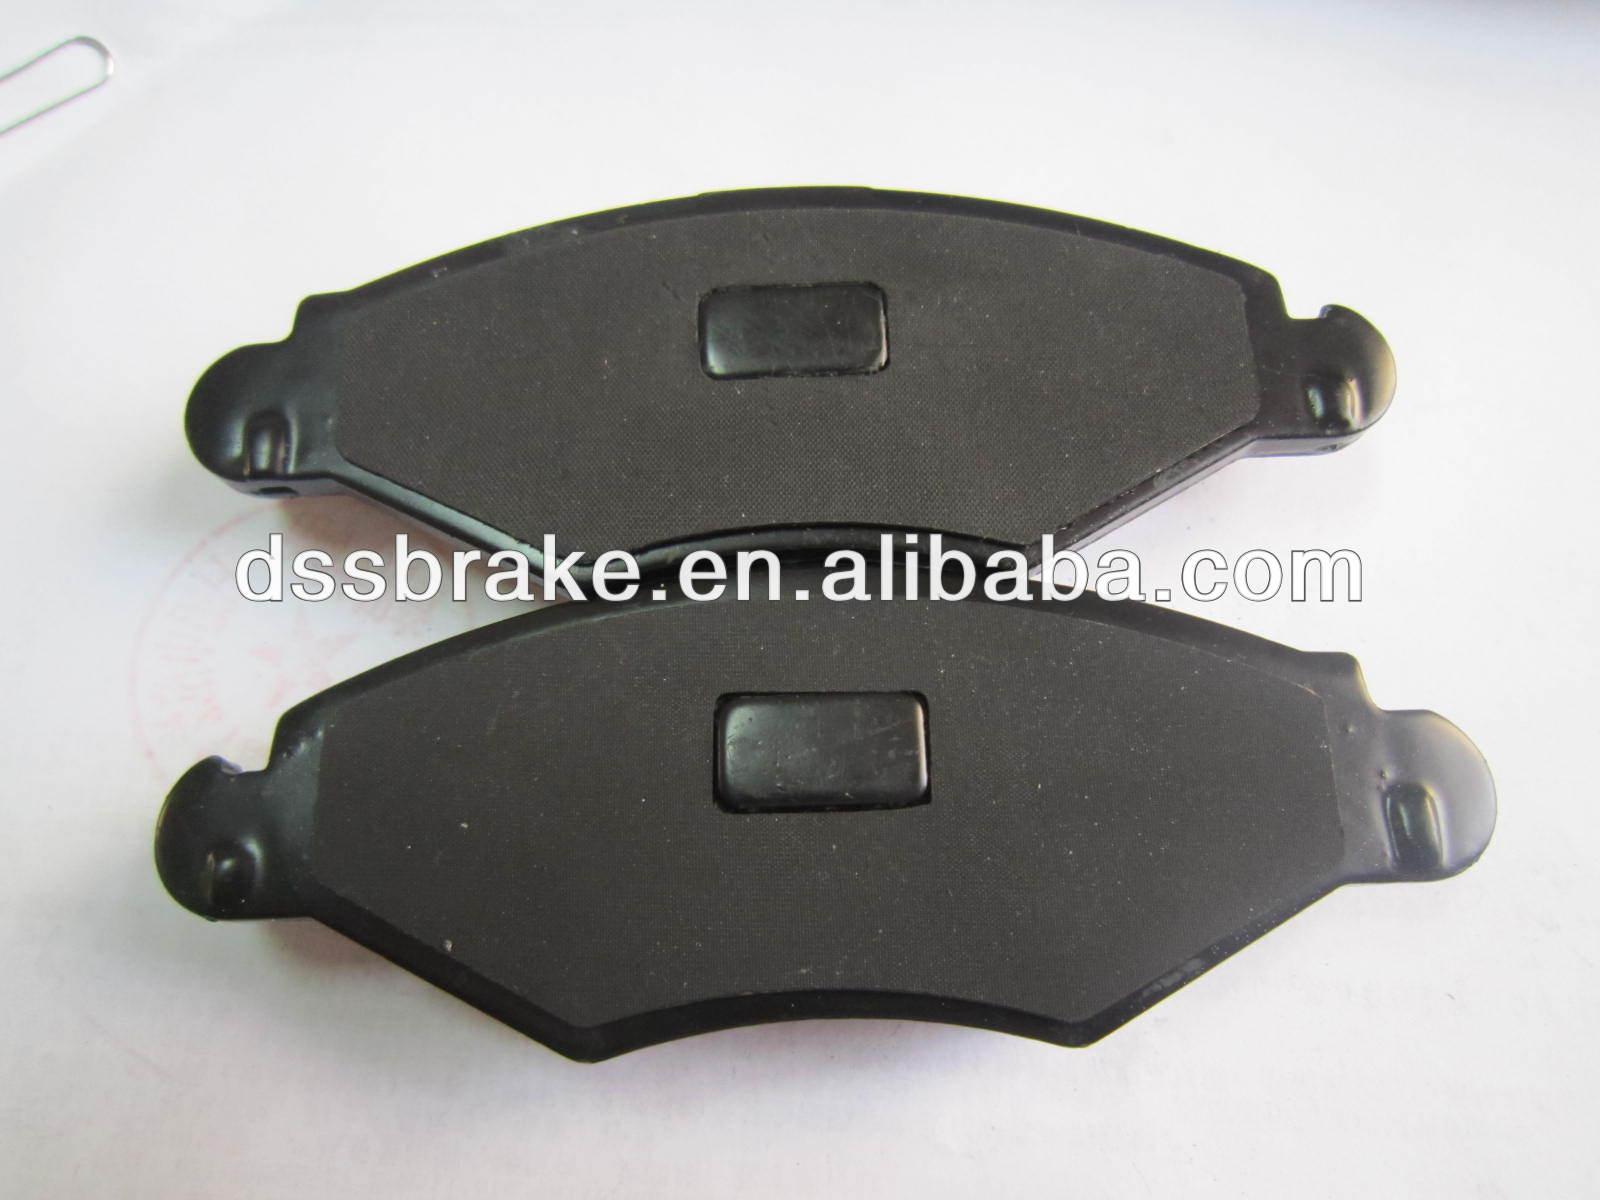 Ferodo Brake Pads Ferodo Brake Pads Suppliers and Manufacturers